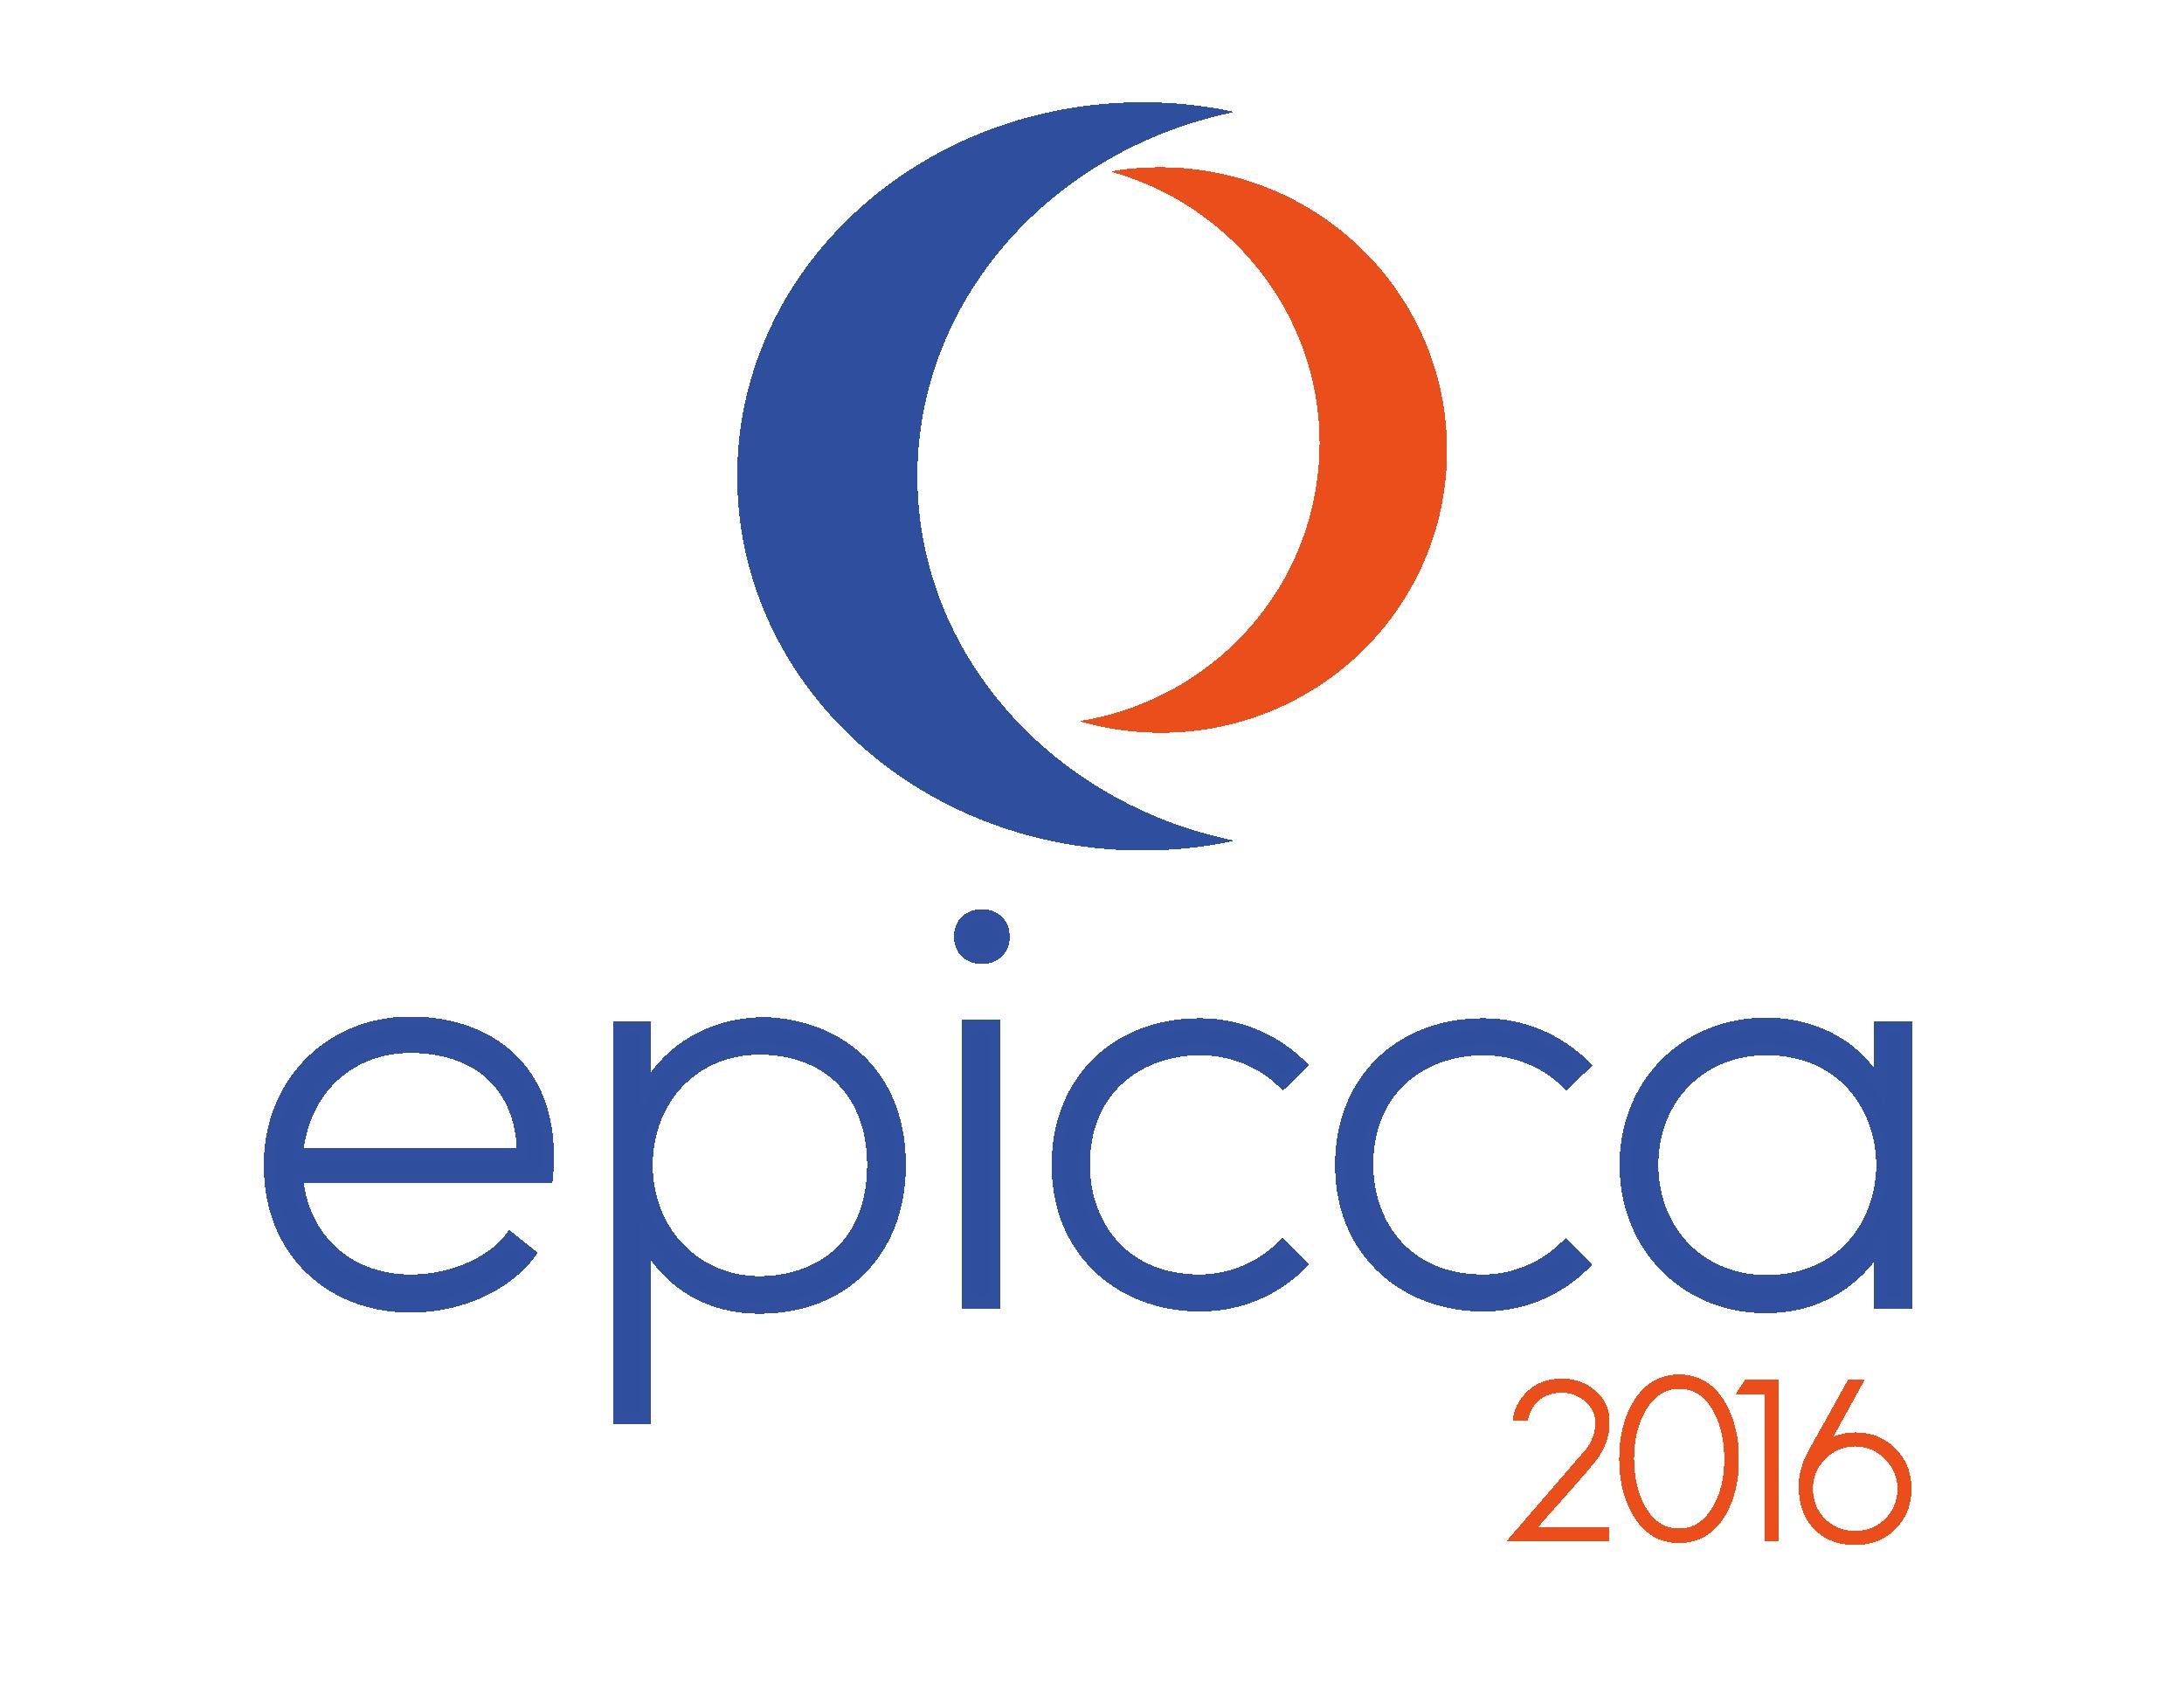 epicca 2016 neuromobile